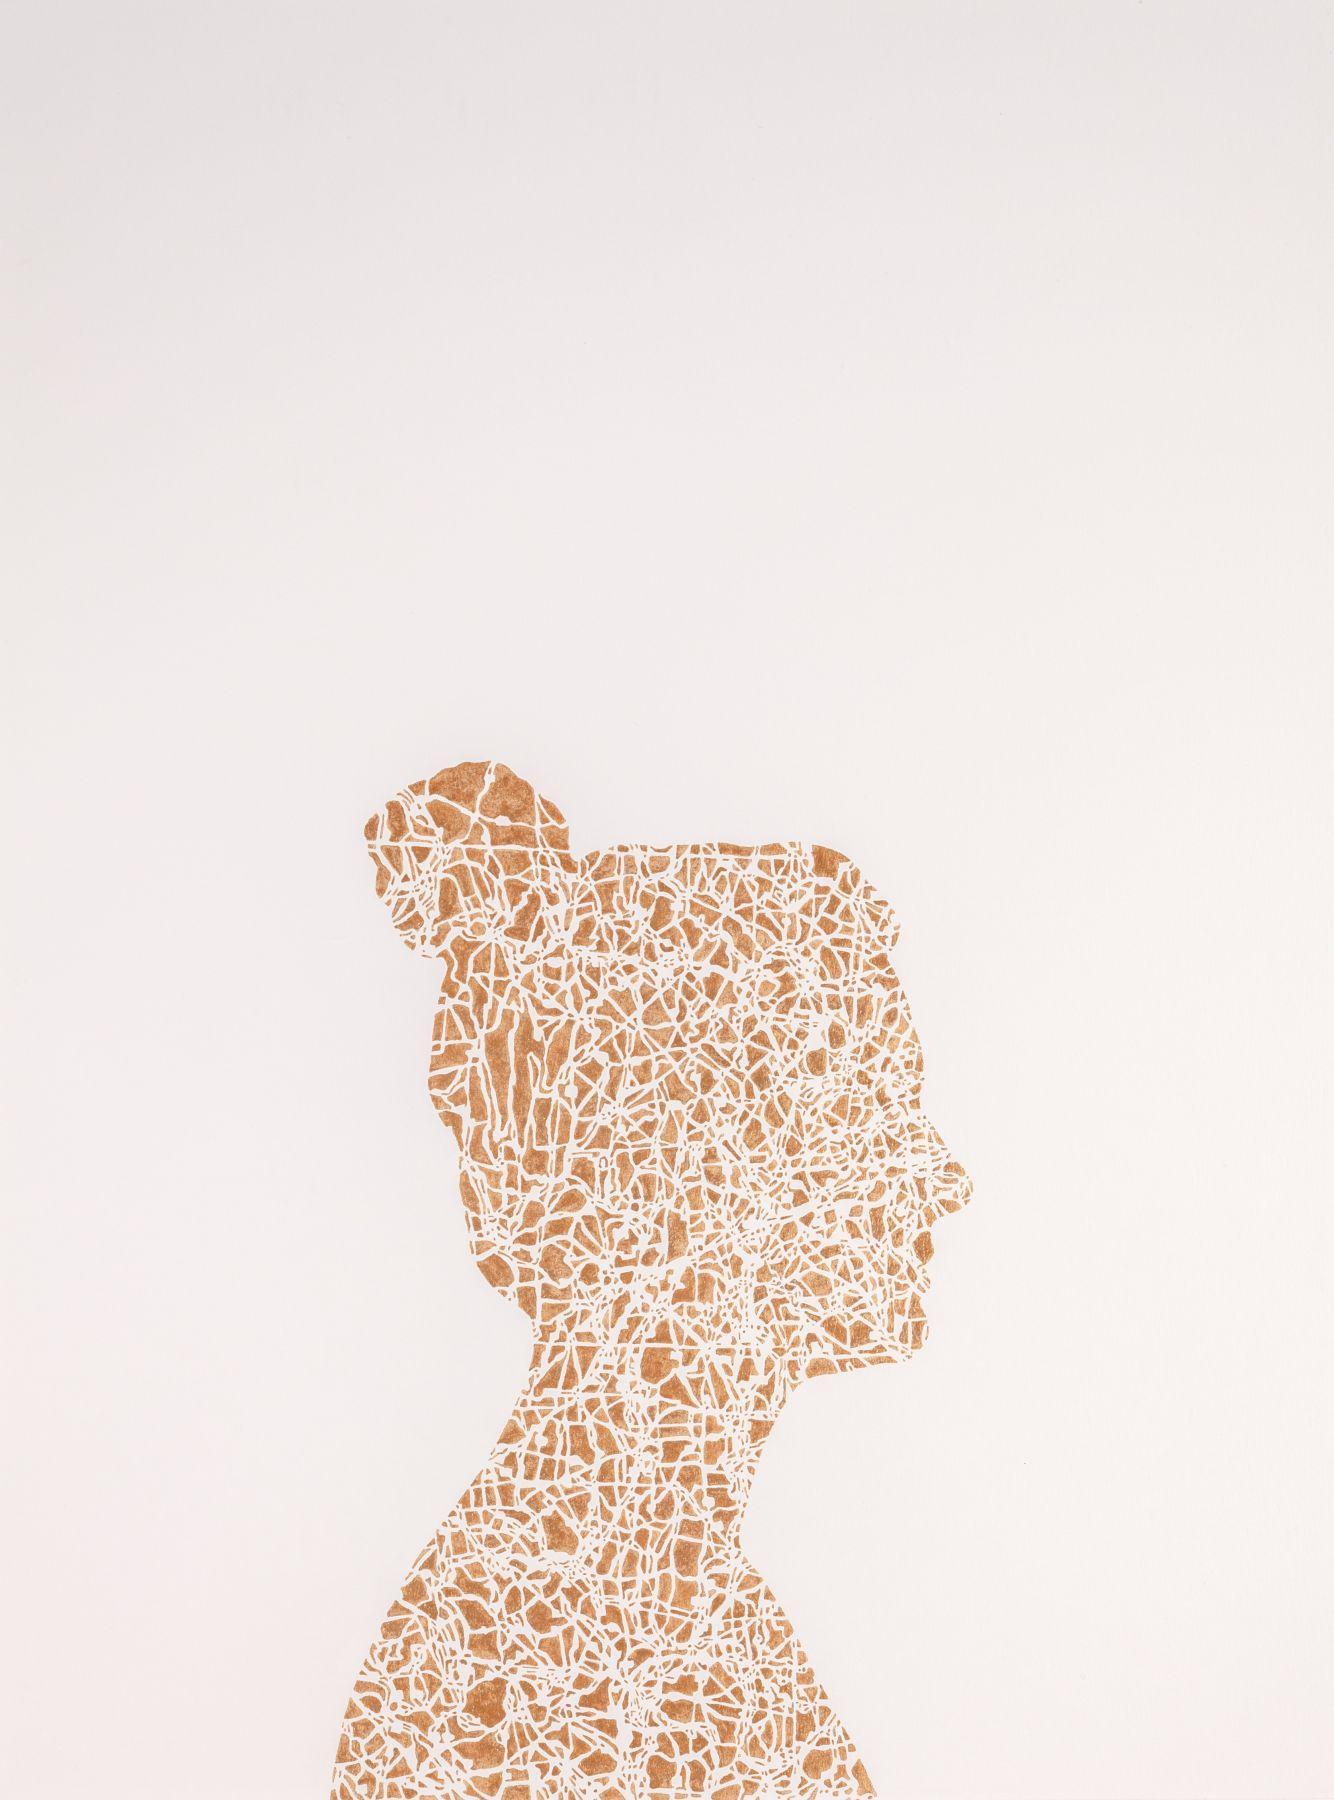 NIKKI ROSATO If I paint us (in gold) II.I, 2016